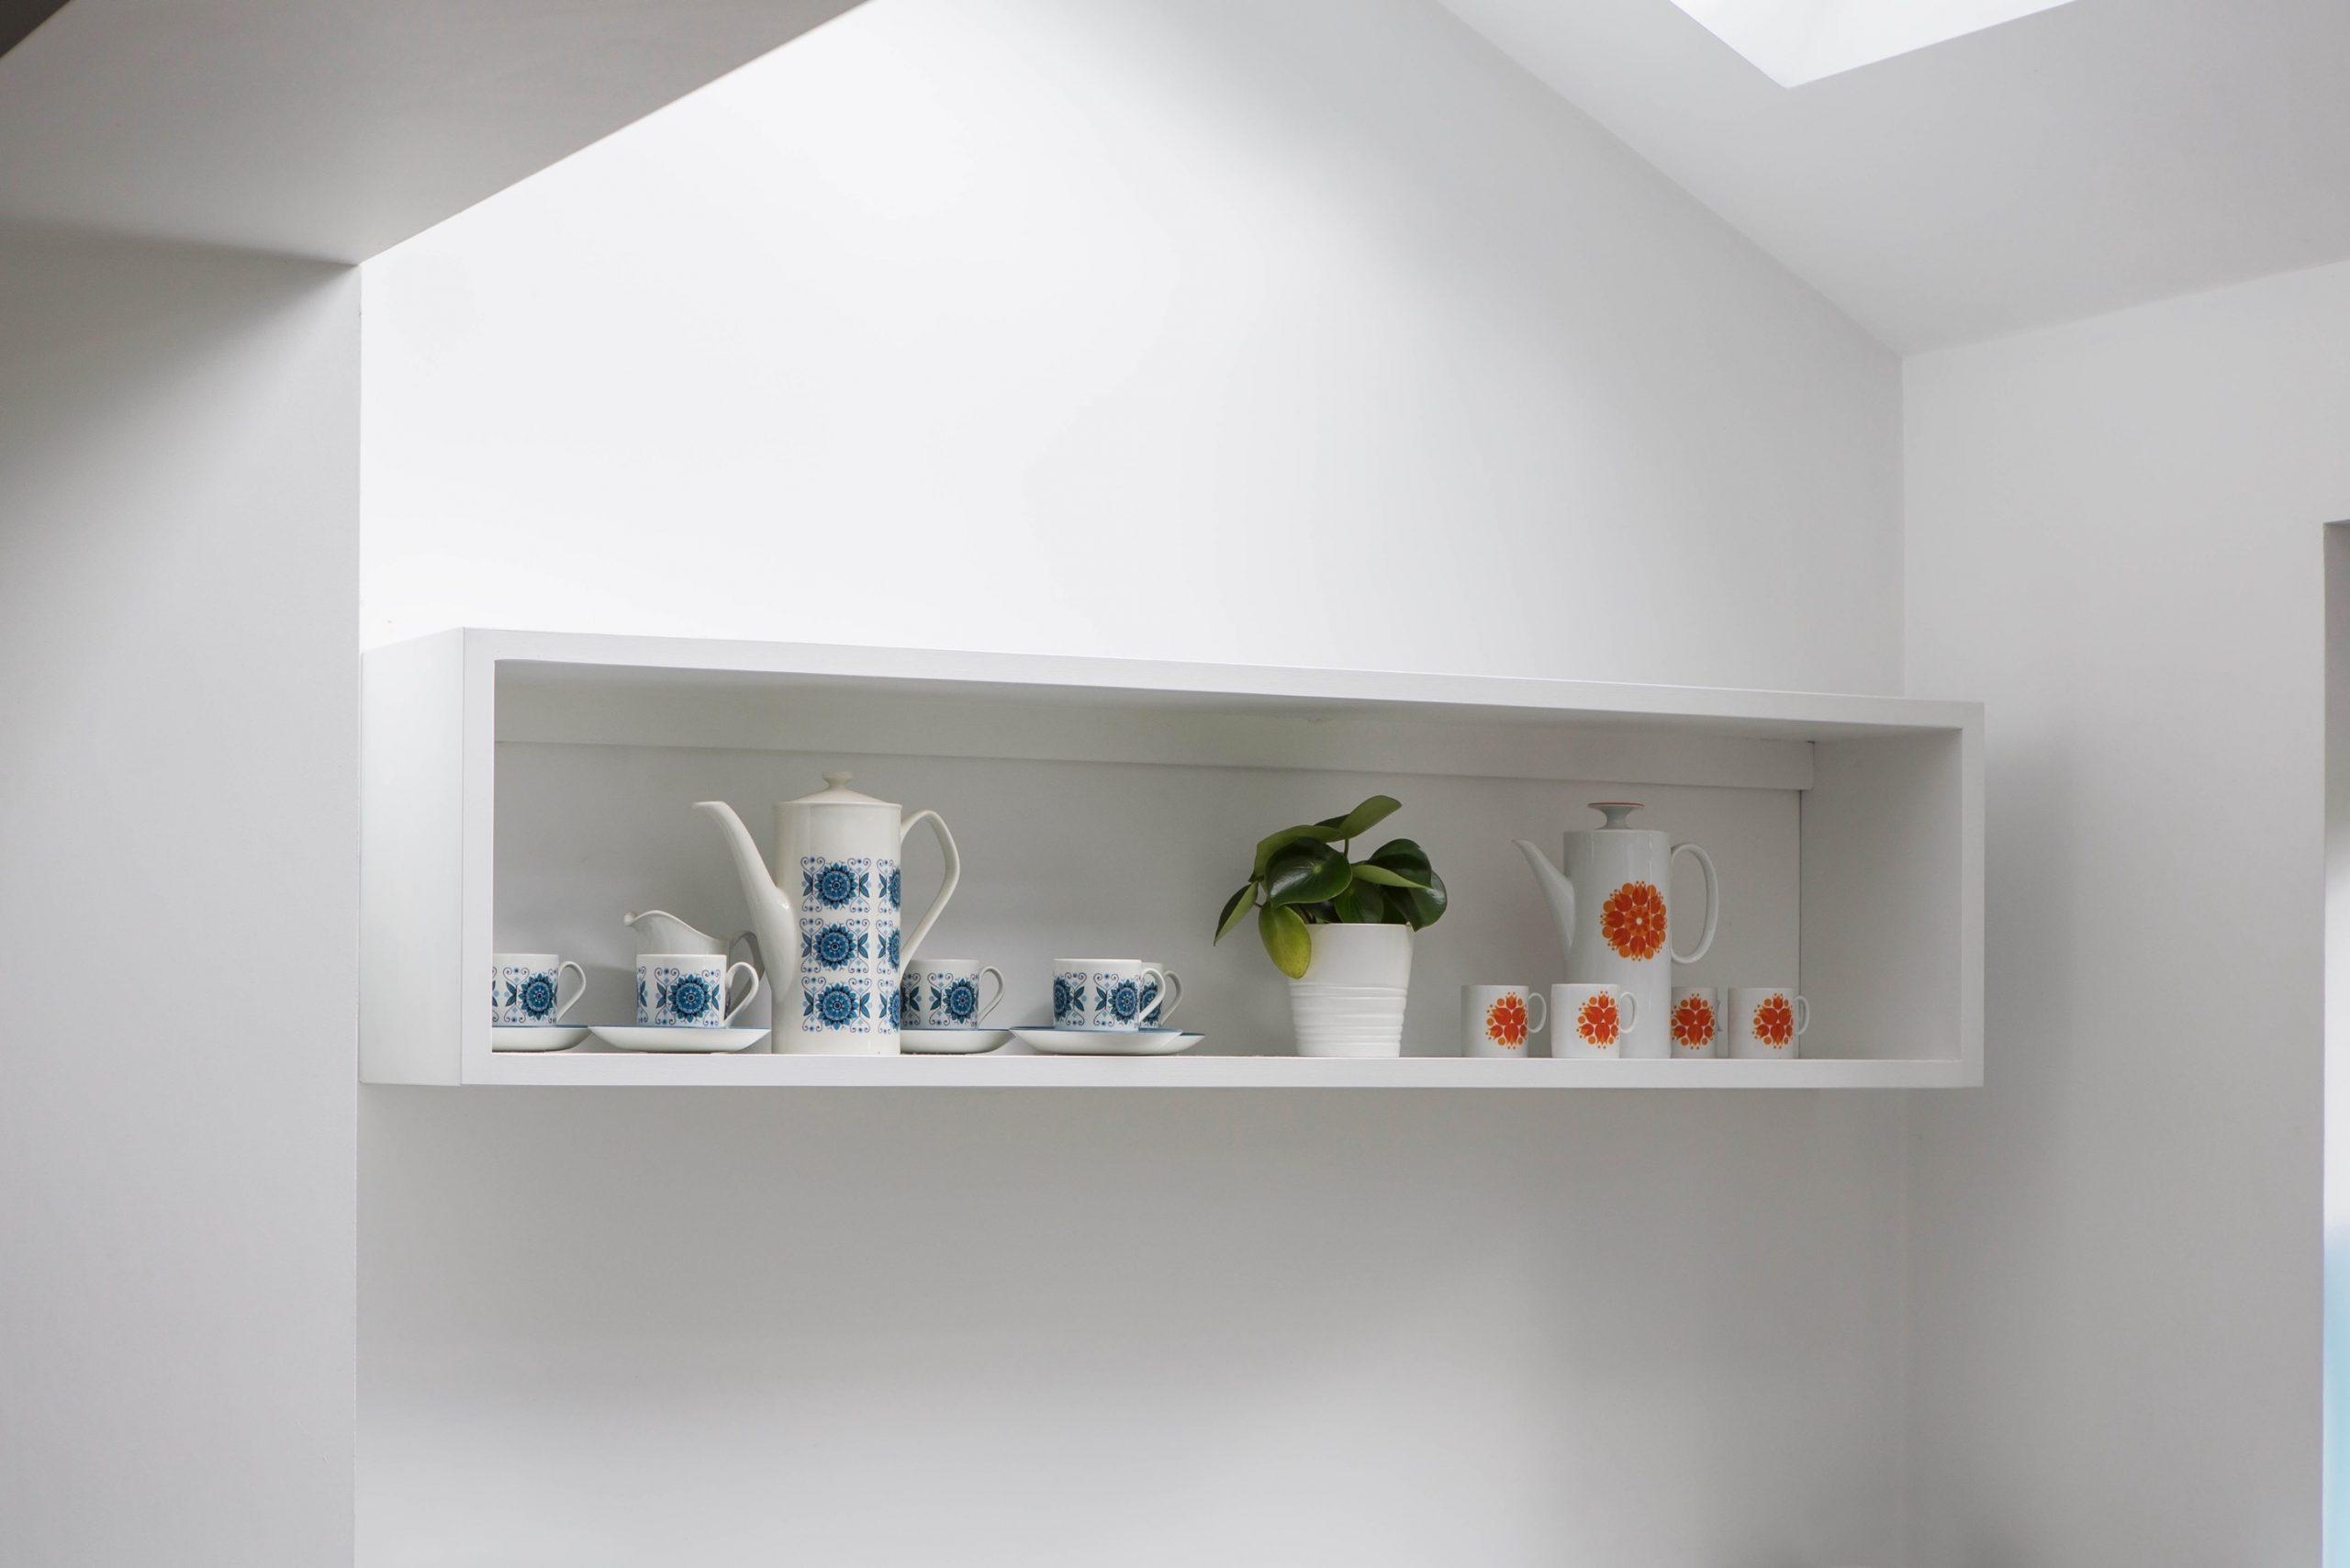 handpainted kitchen box shelf south stewkley bucks 1 scaled